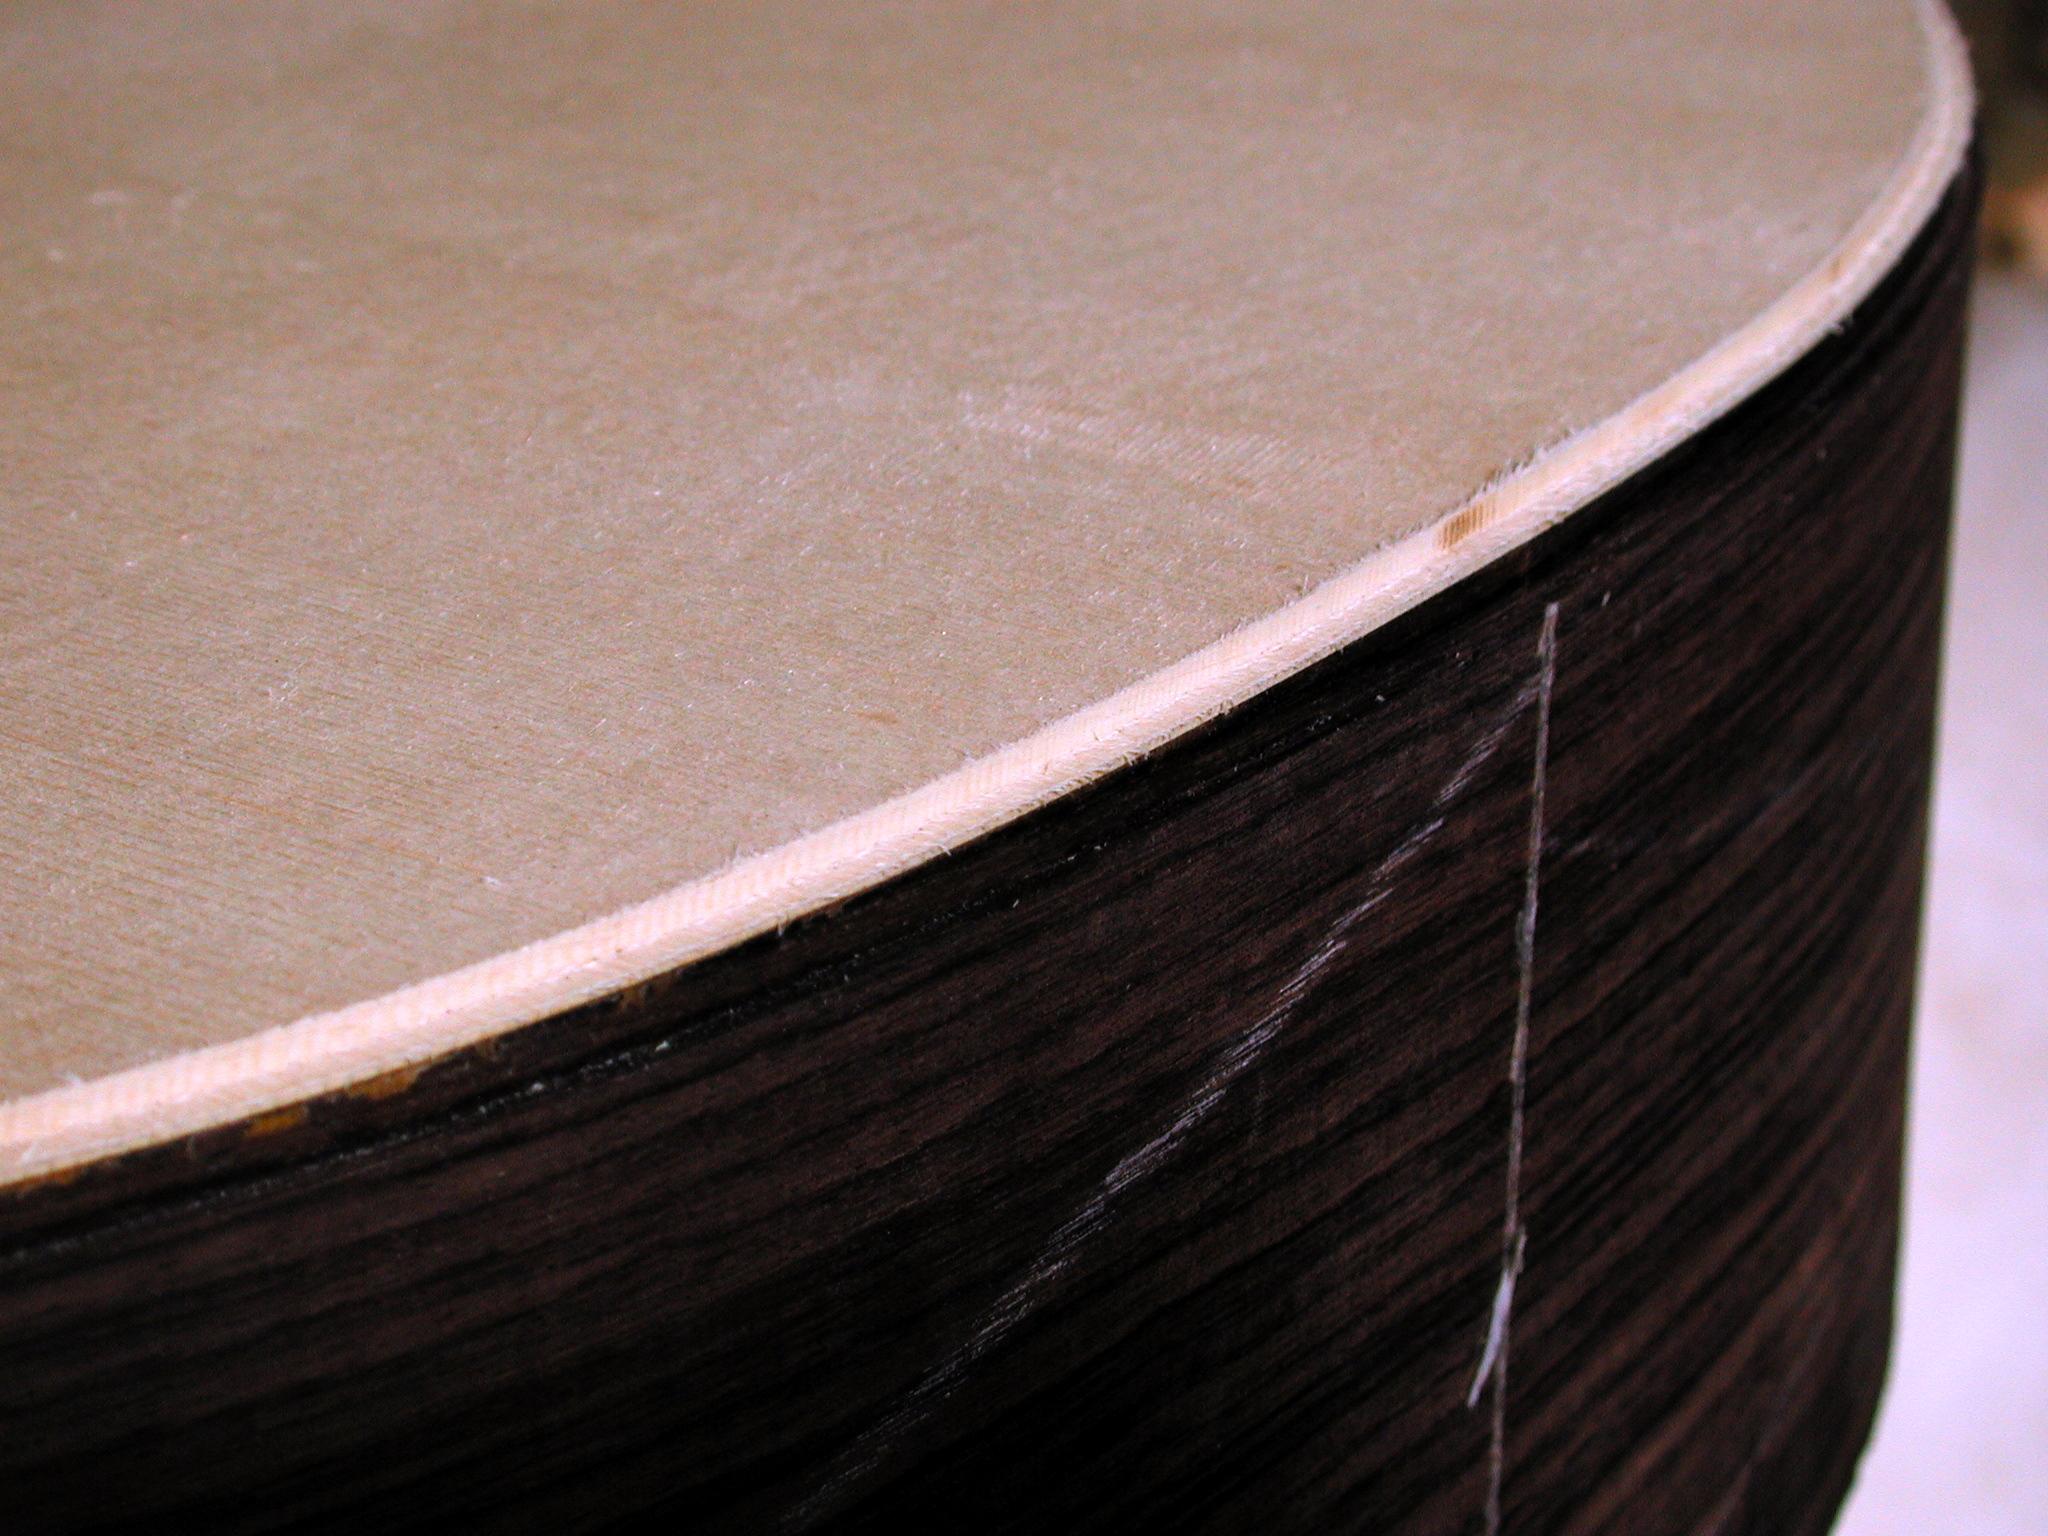 Bindings: The ledge for the binding has been cut.